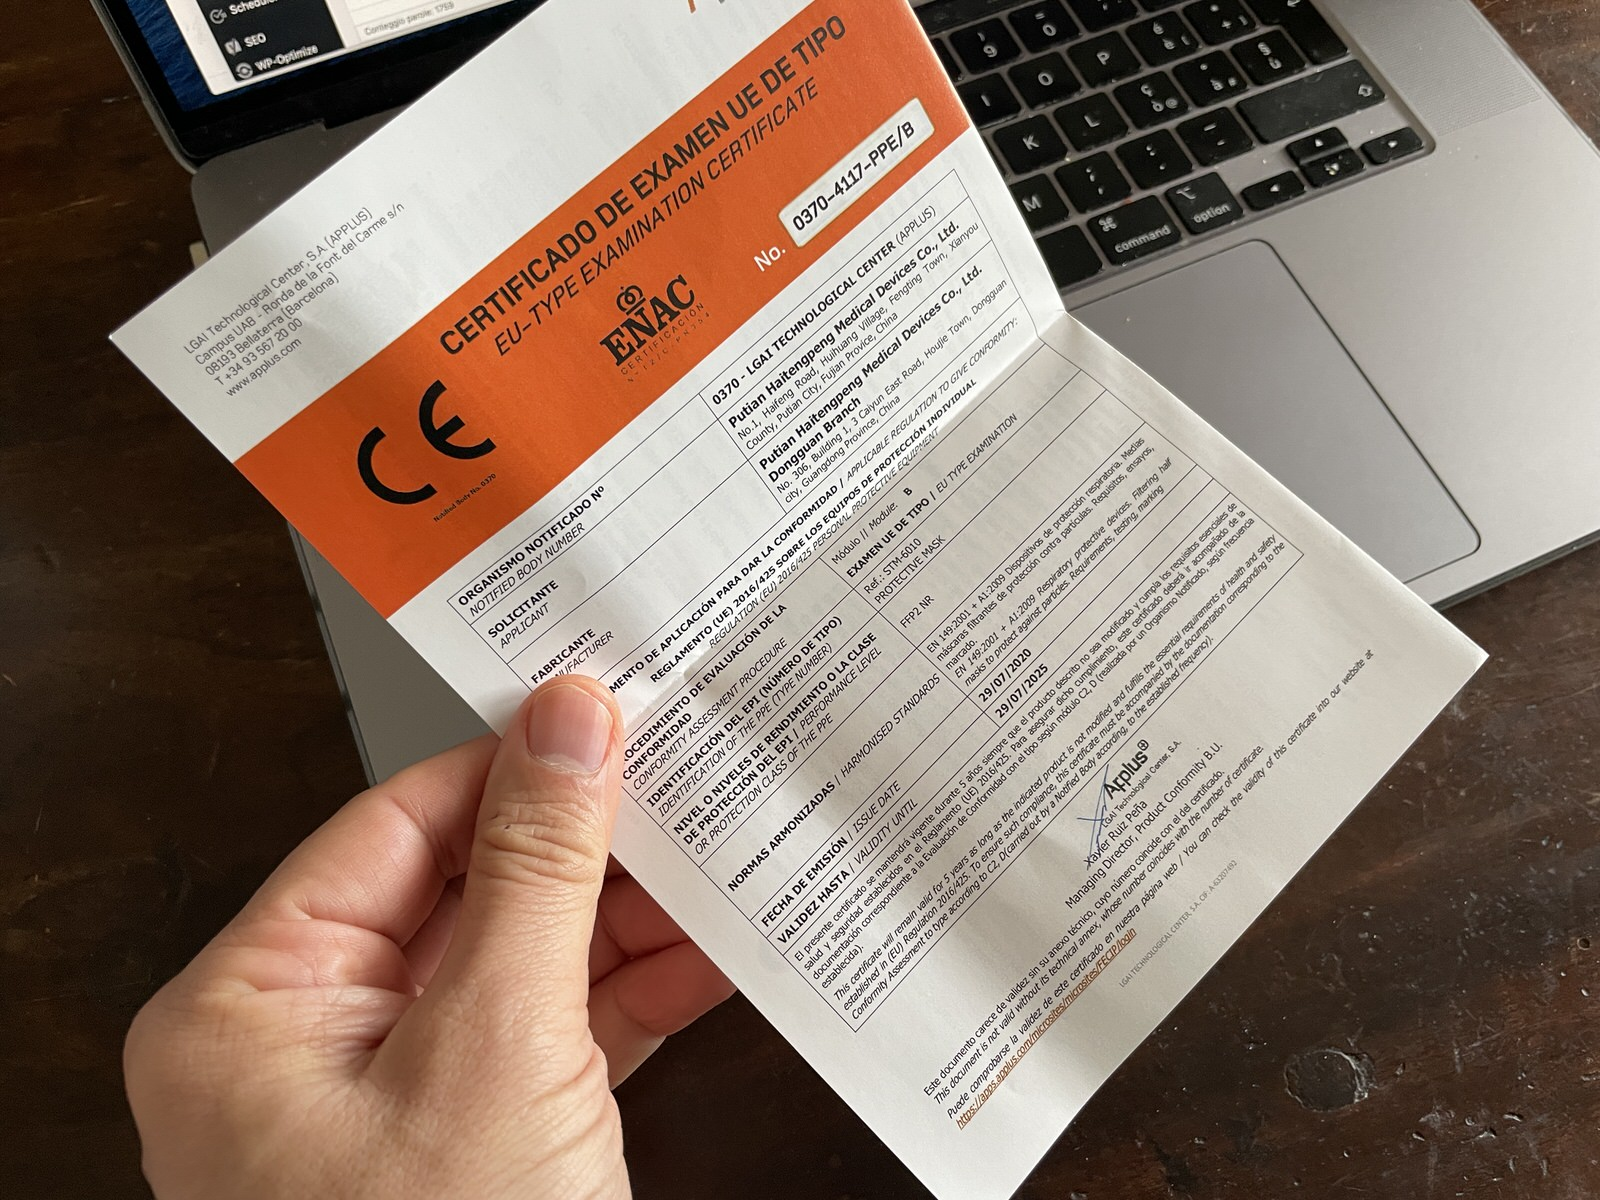 Mascherine FFP2 certificate e comode: solo oggi meno di 0,80€ l'una